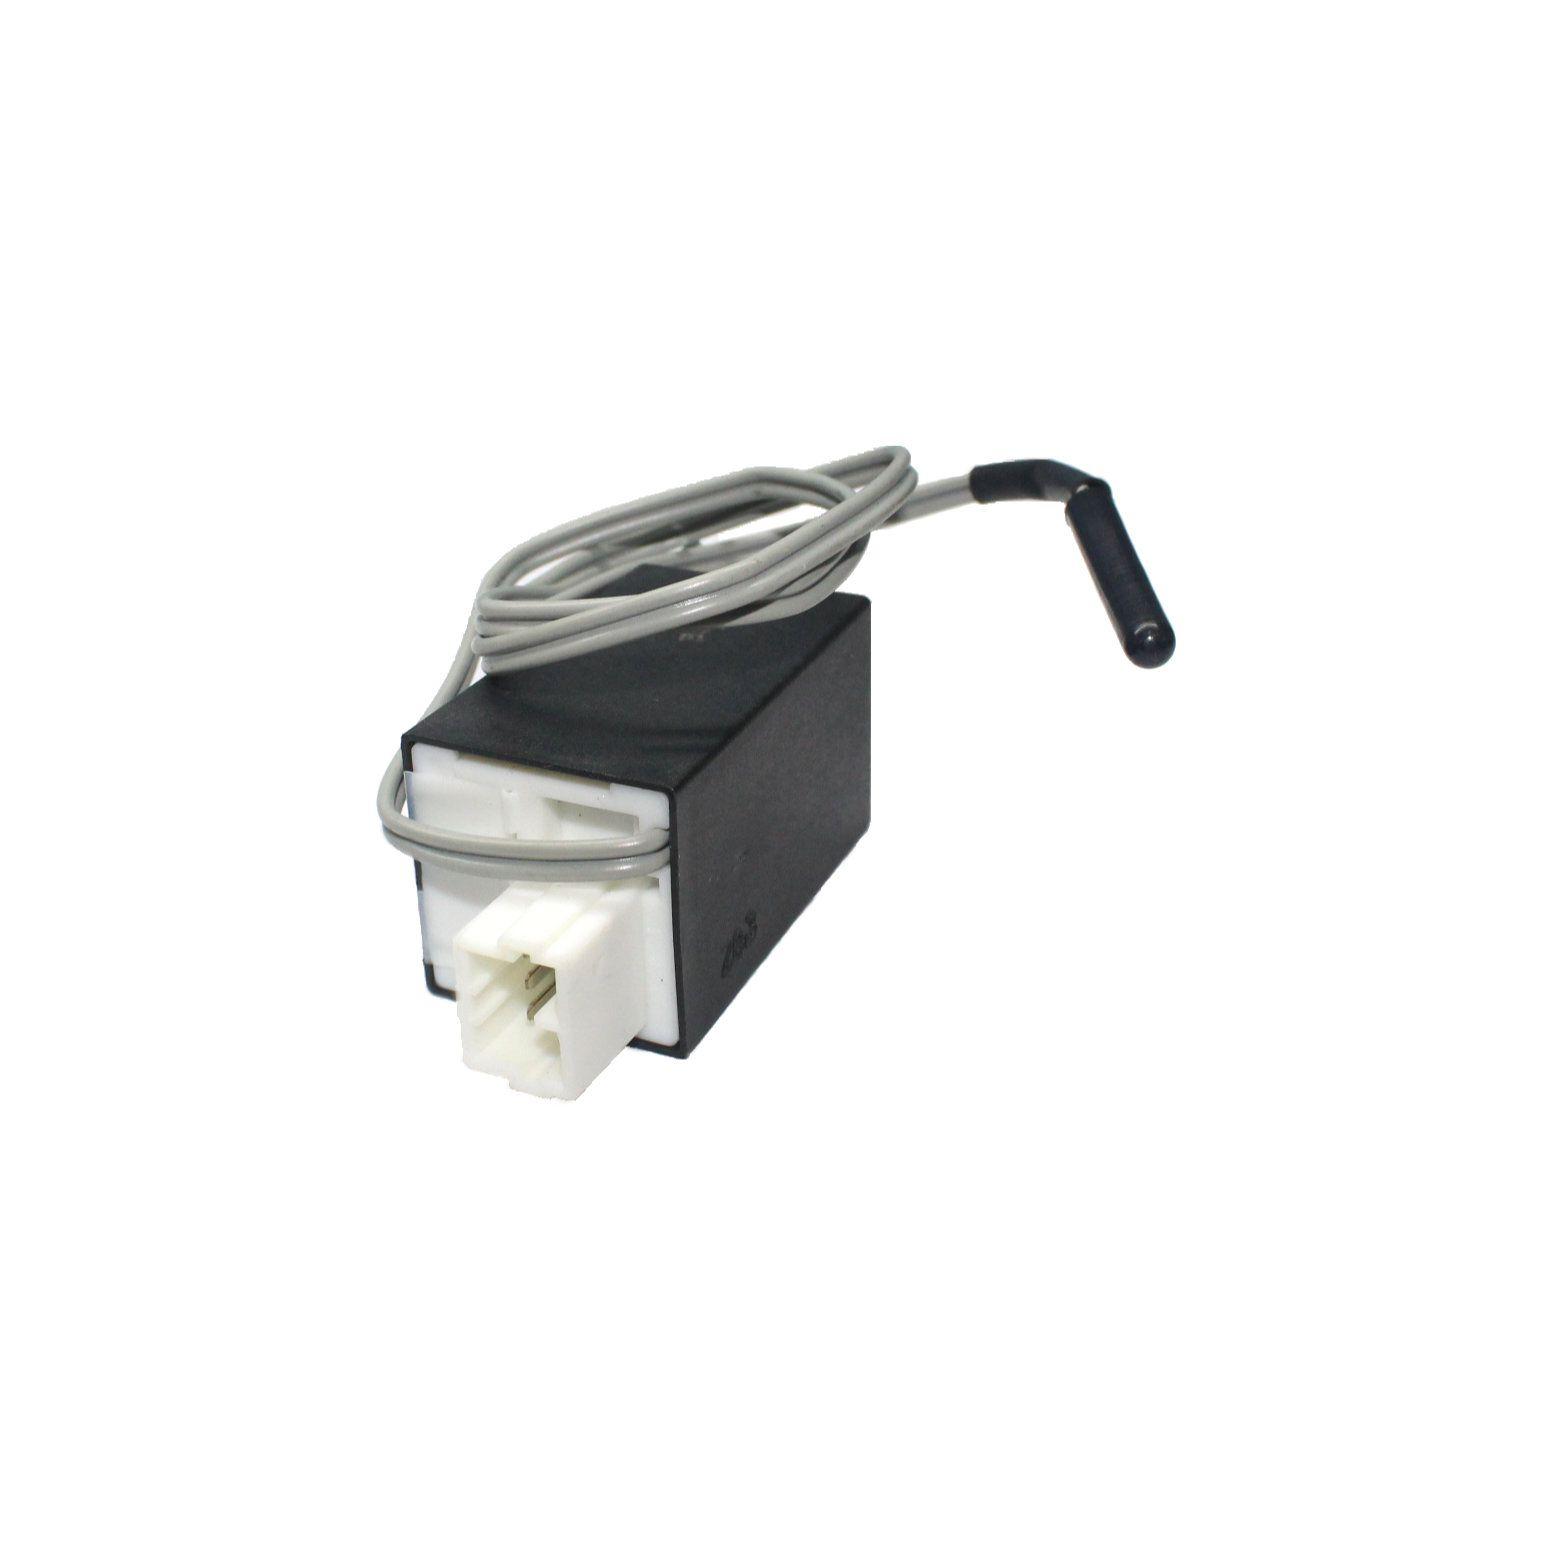 Sensor Termostato Caixa de Ar Palio, Fiesta - c/ 3 vias